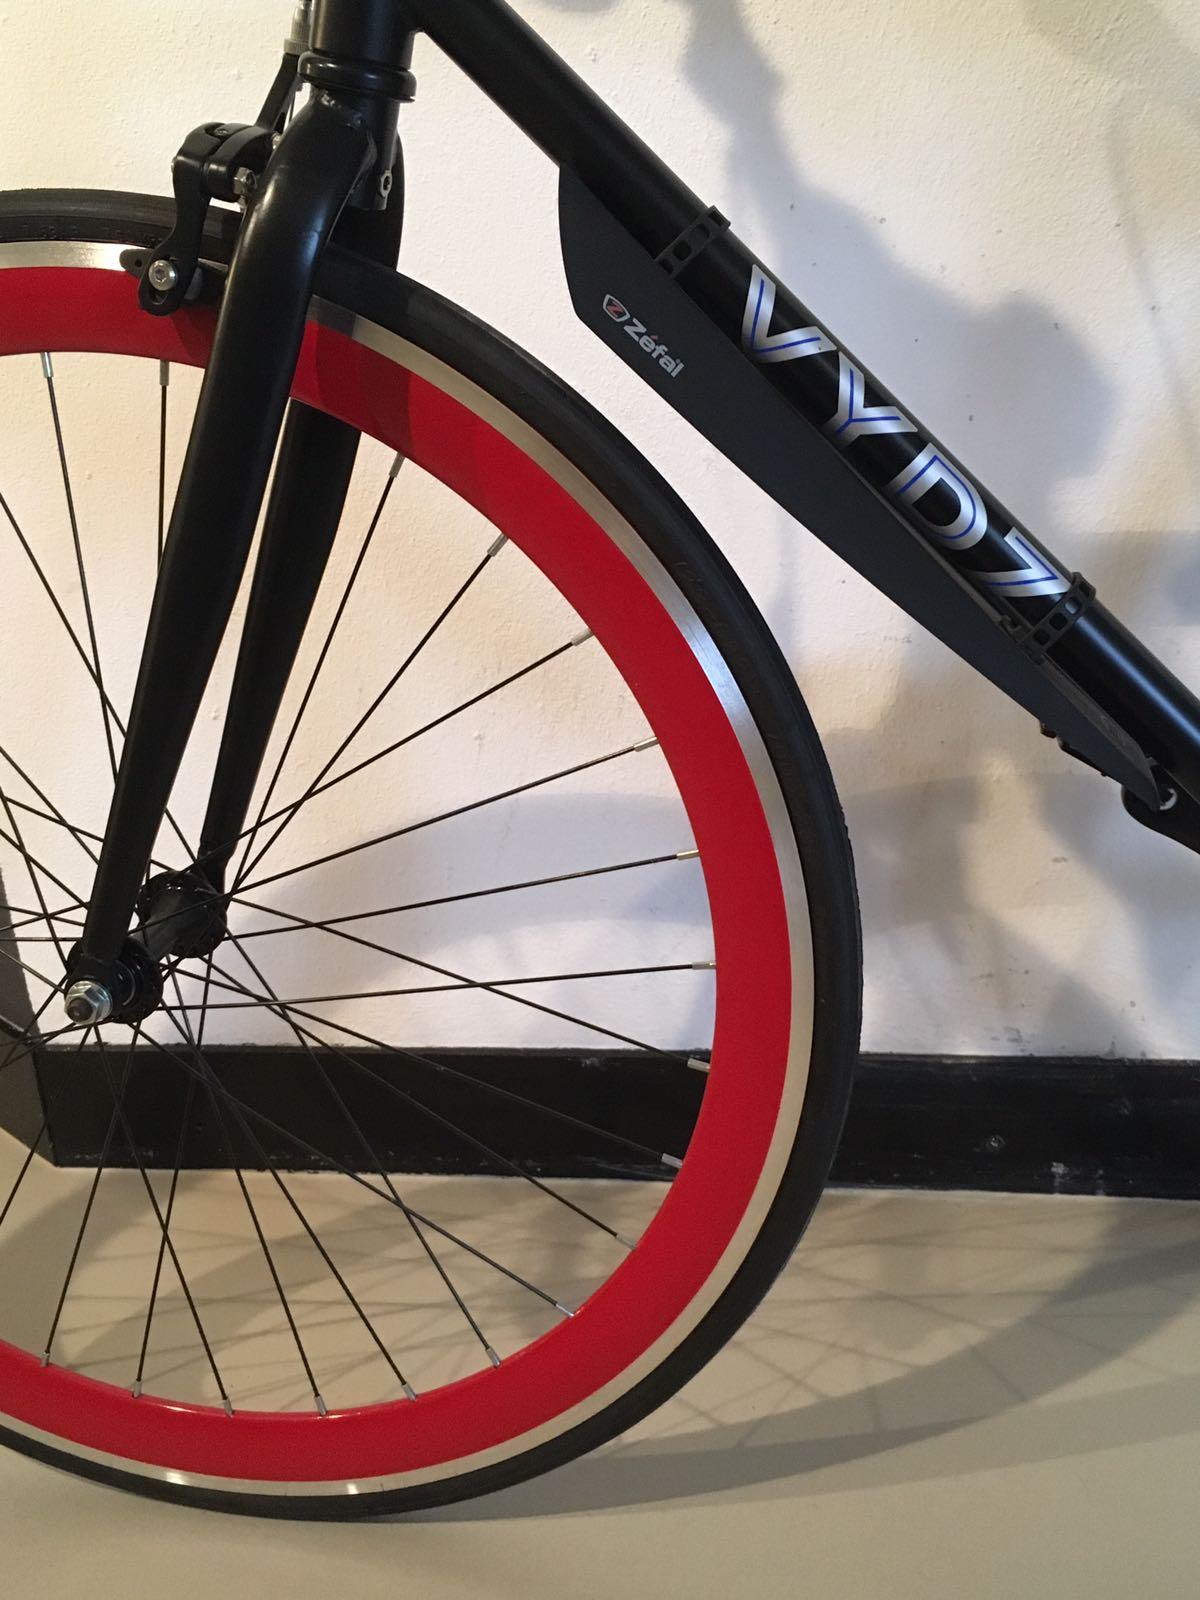 goedesportieve fiets, sportieve retro fiets, sportieve lichtgewicht fiets,